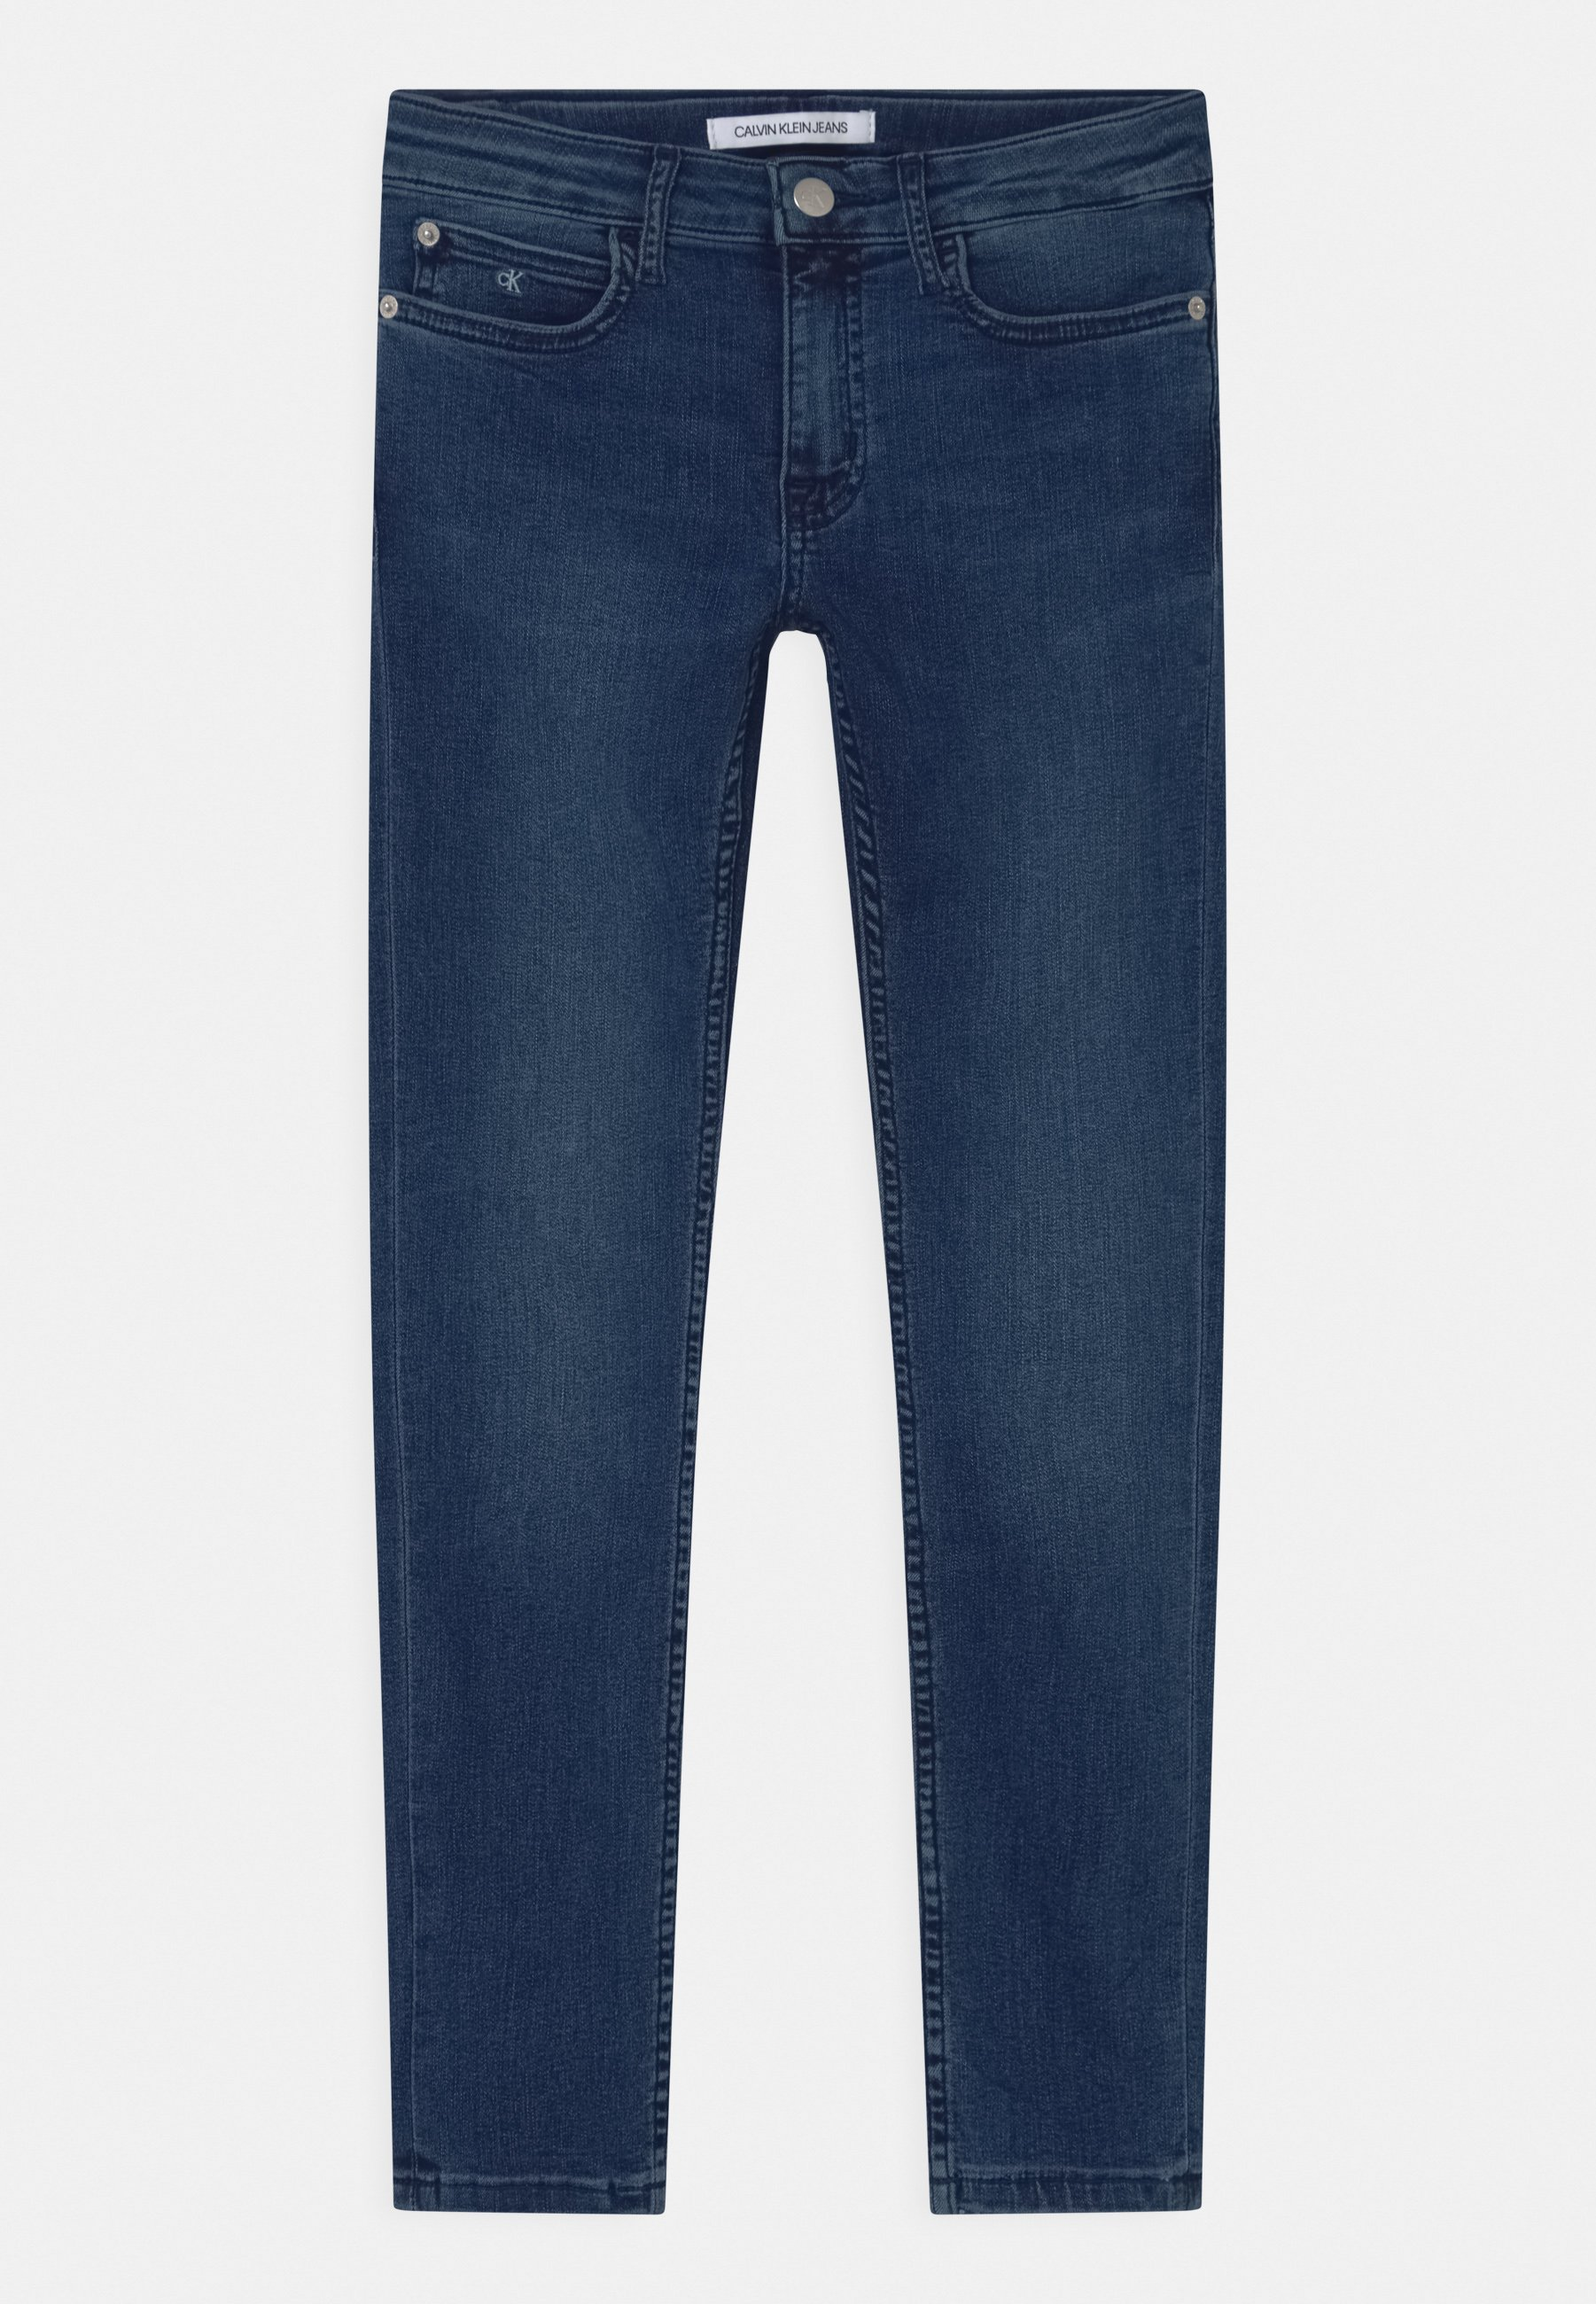 Enfant SKINNY  - Jeans Skinny - essential royal blue